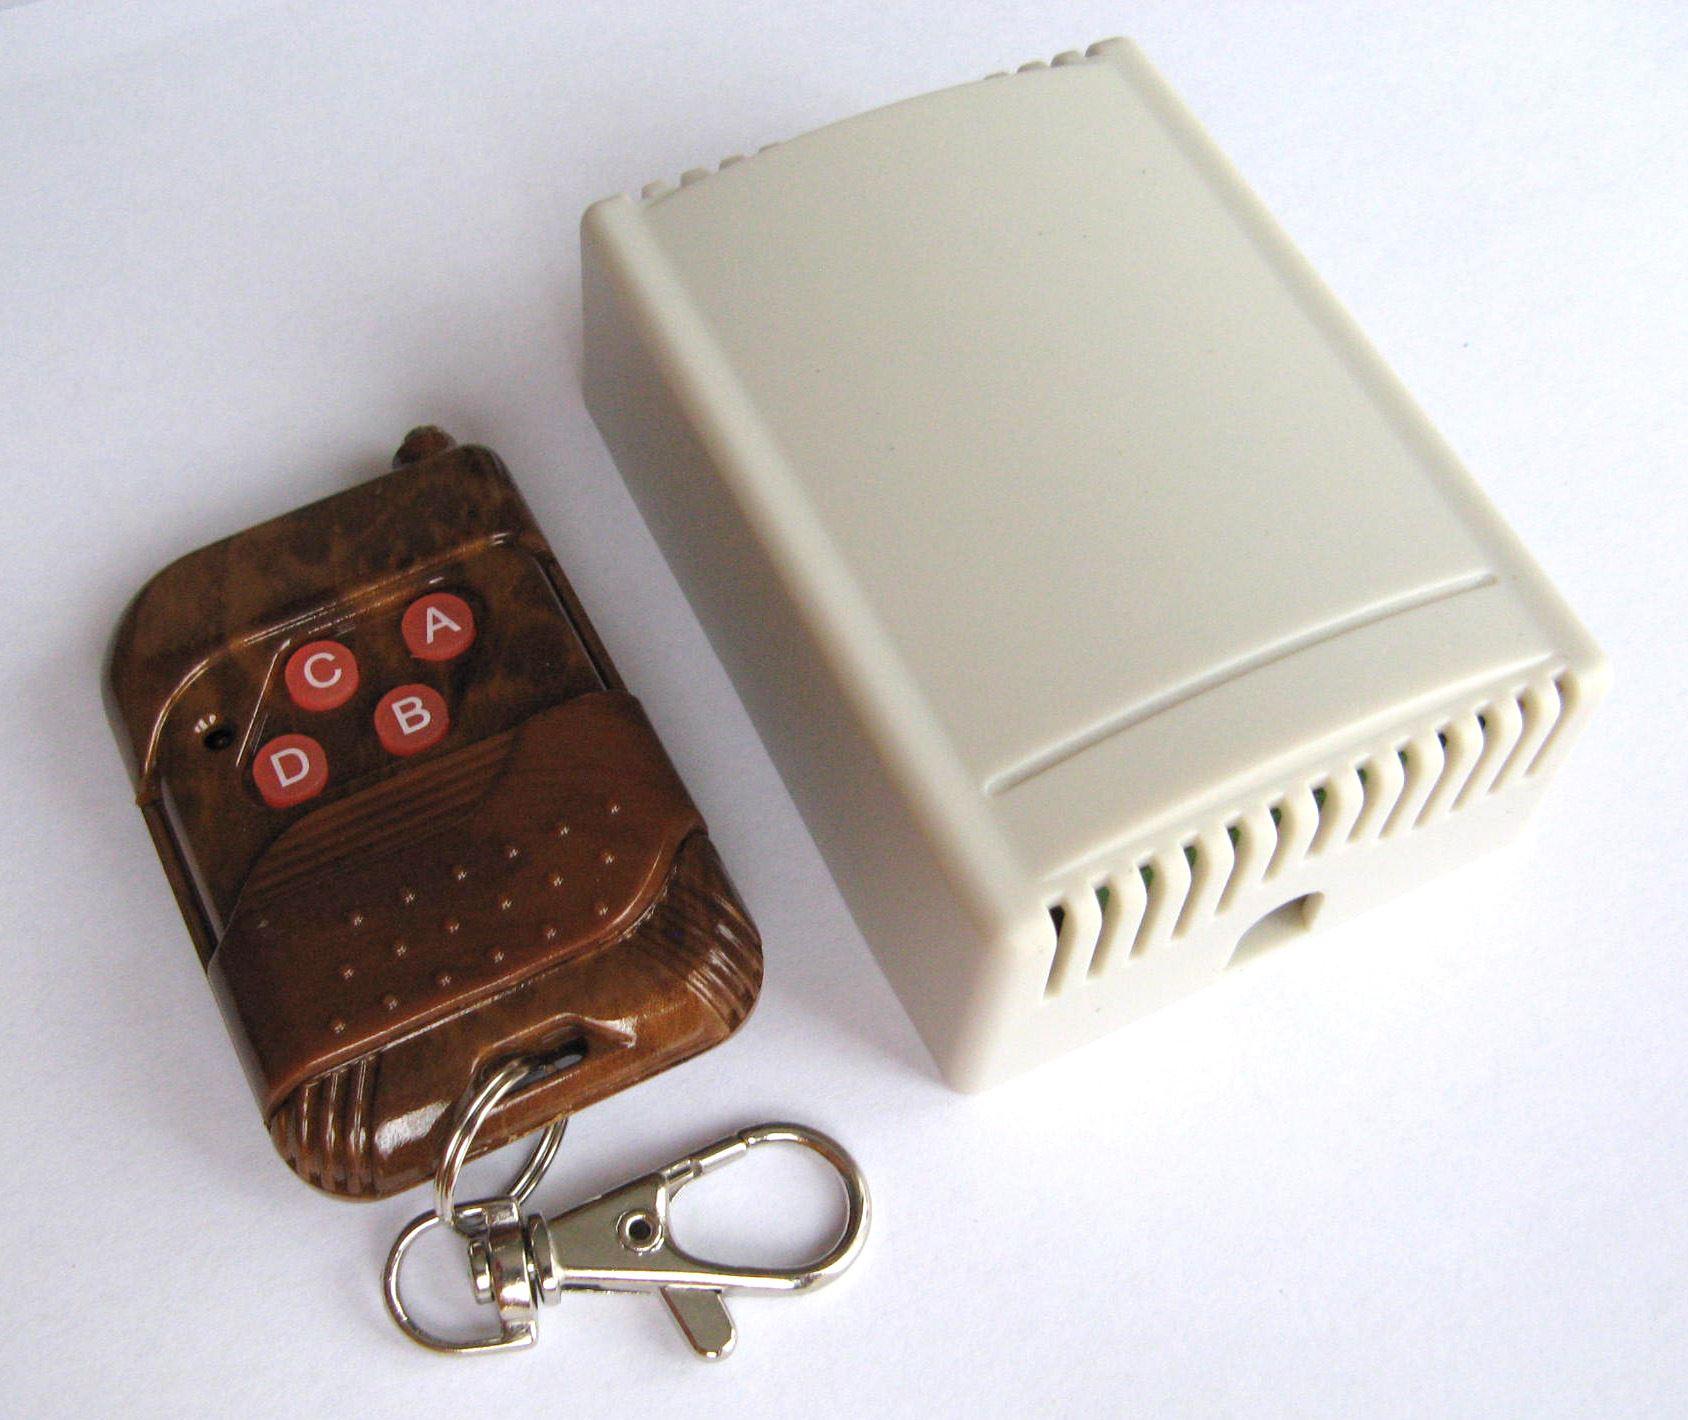 4 Channel DC 12V AC 240V RF Wireless Remote Control Switch Relay Transmitter 4CH